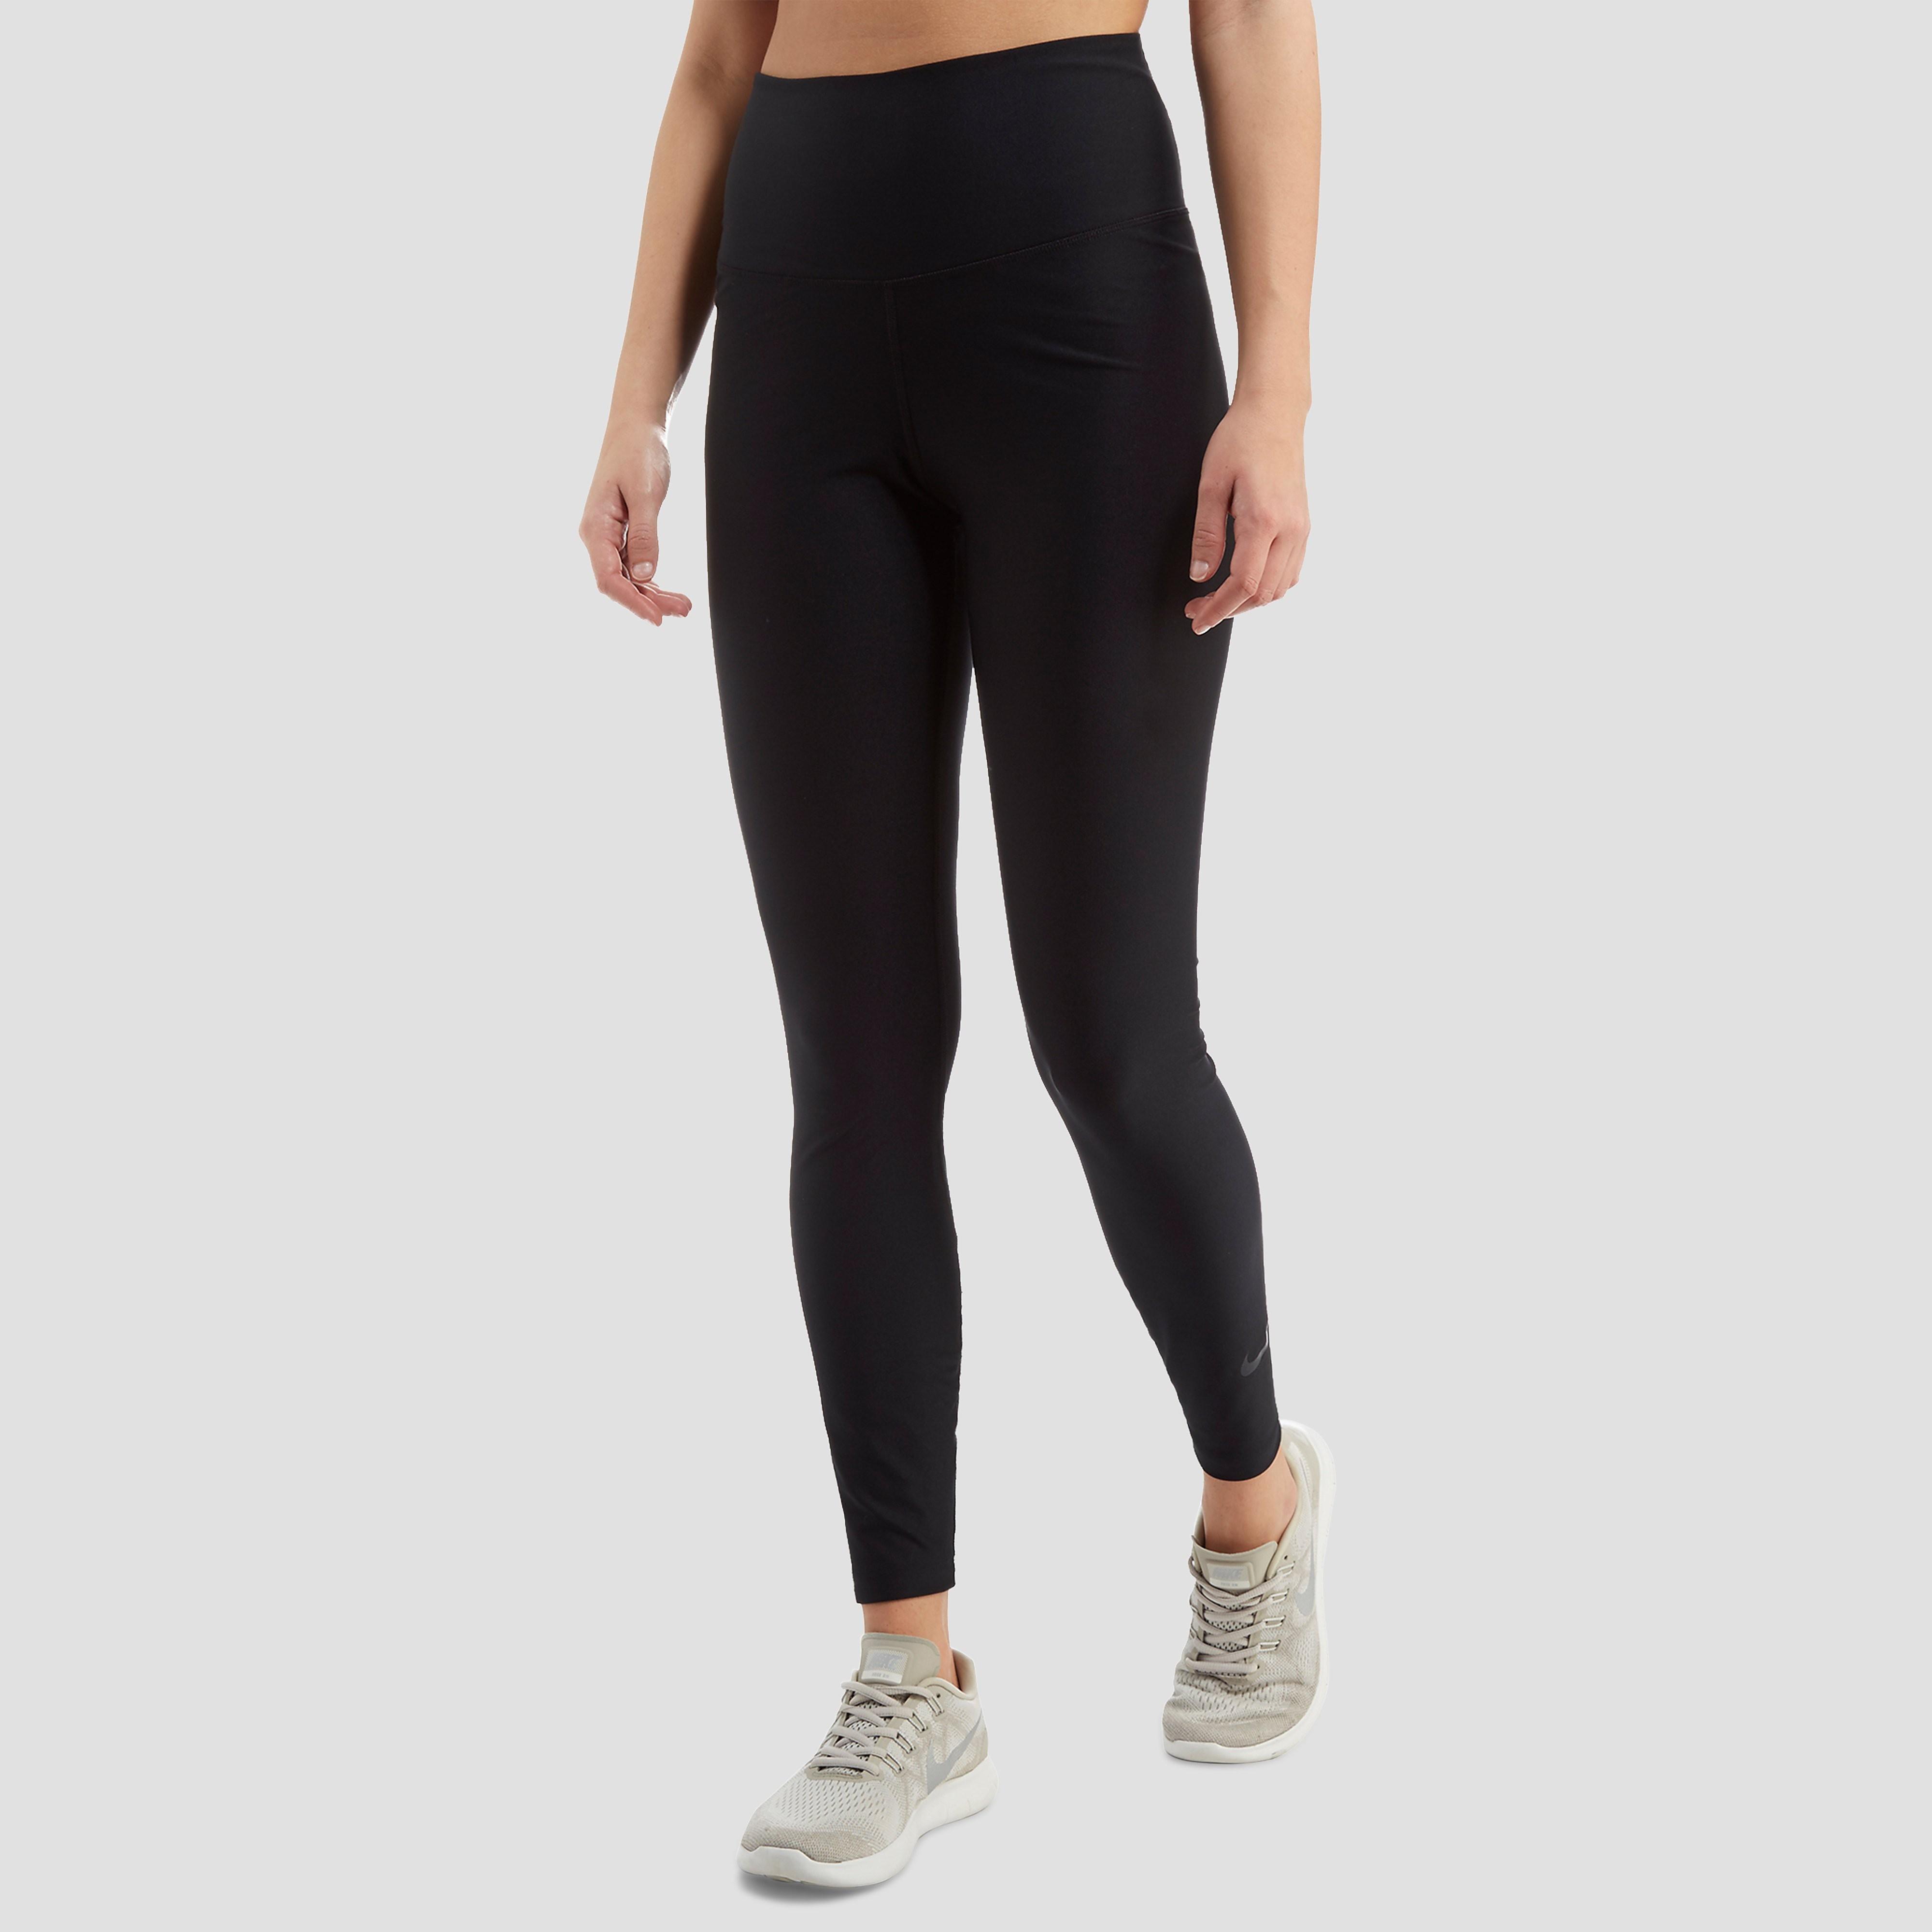 Nike High Rise Sculpt Women's Tights